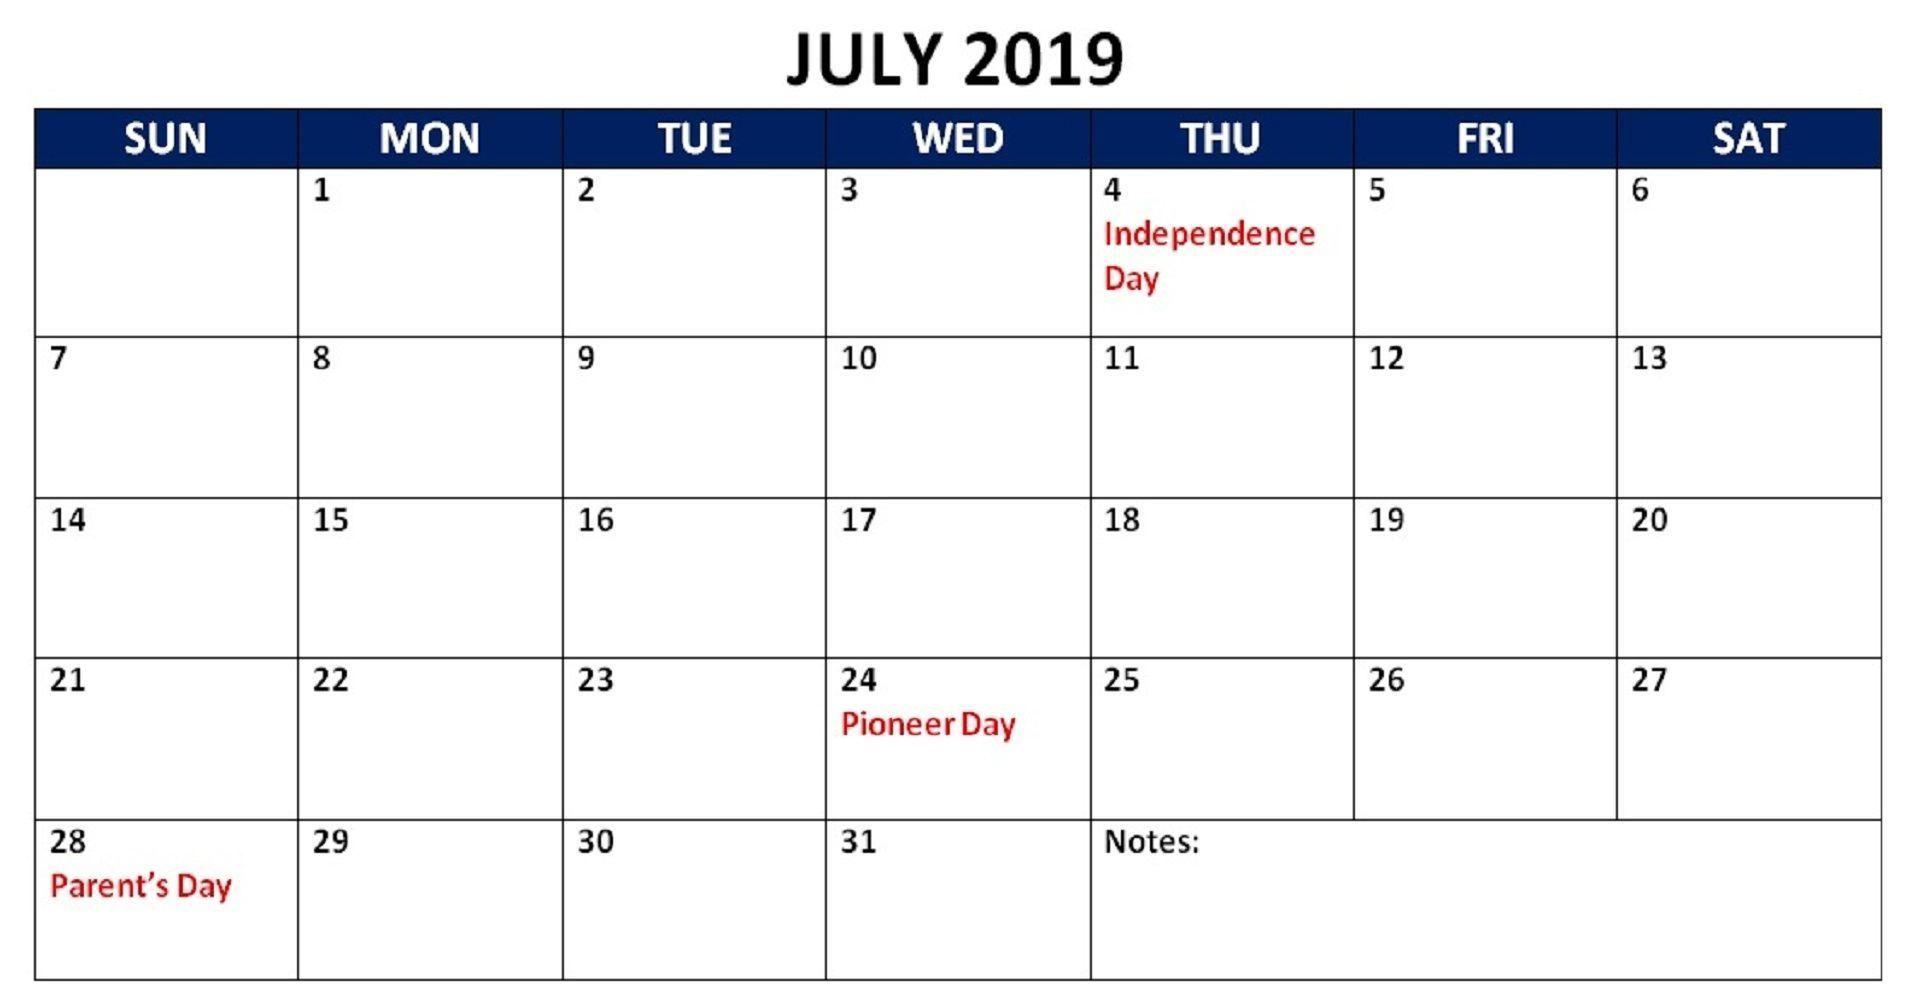 July 2019 Holidays Calendar